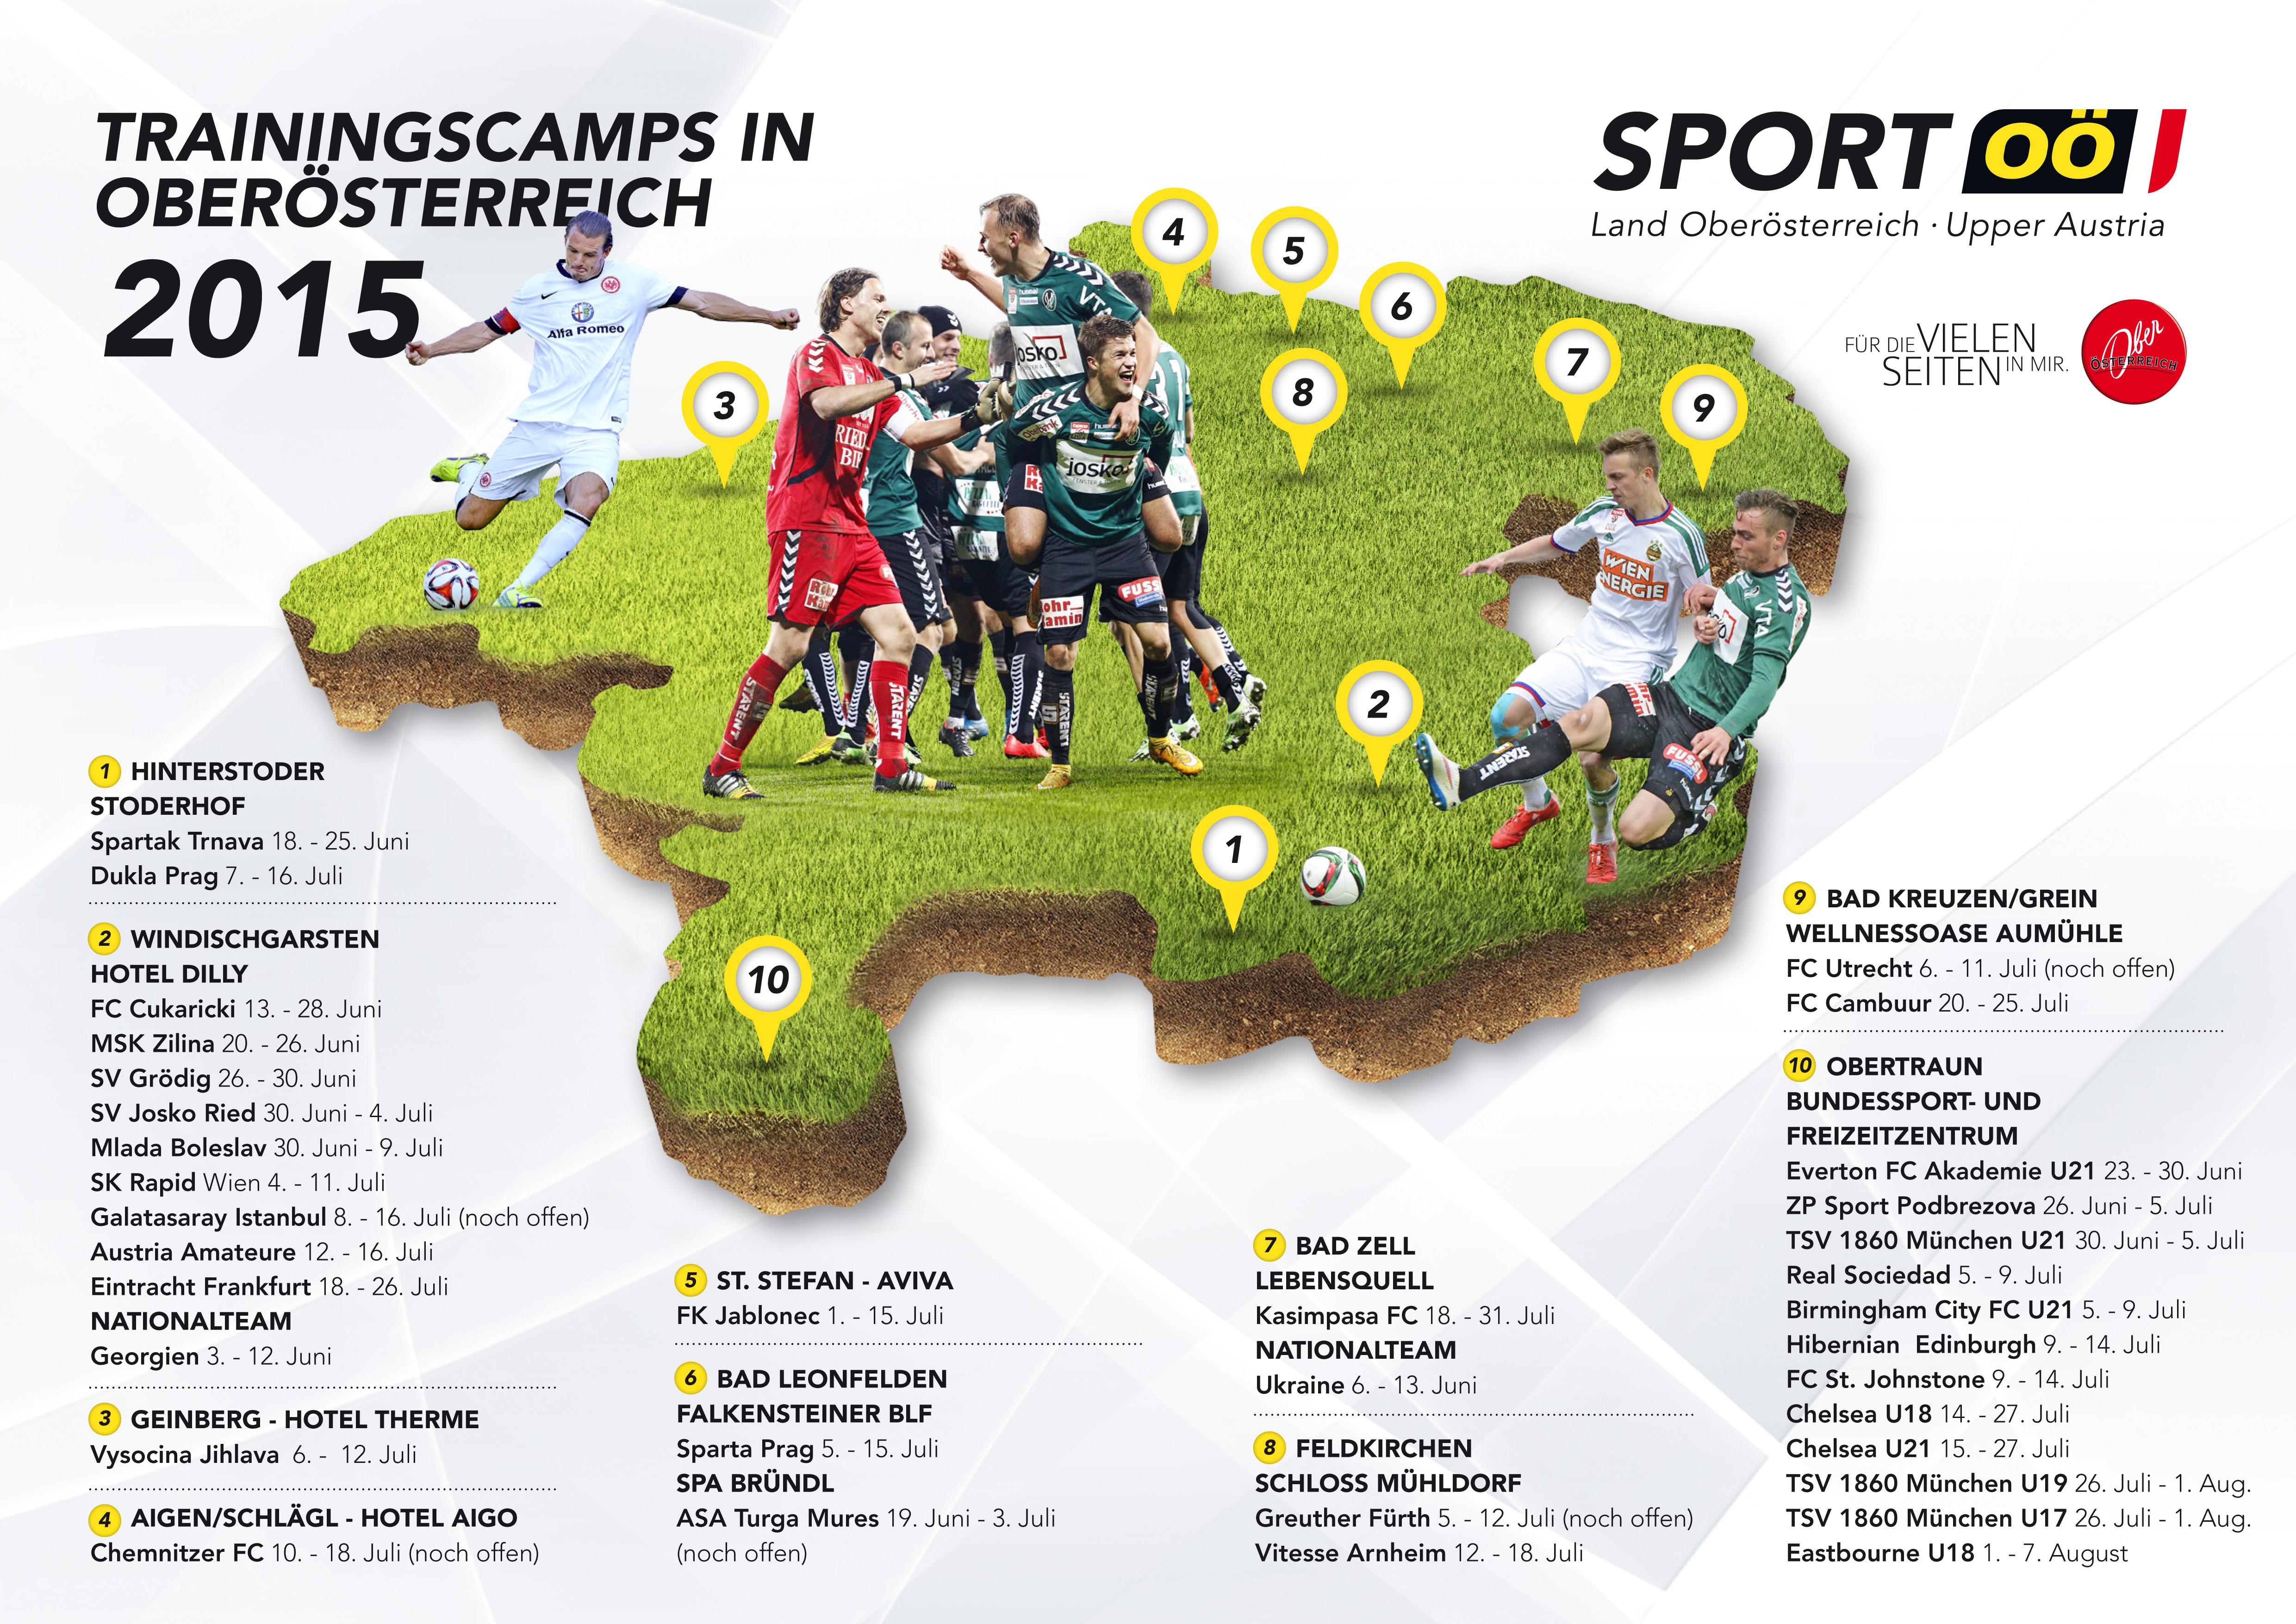 Fussball Trainingscamps in Oberösterreich 2015